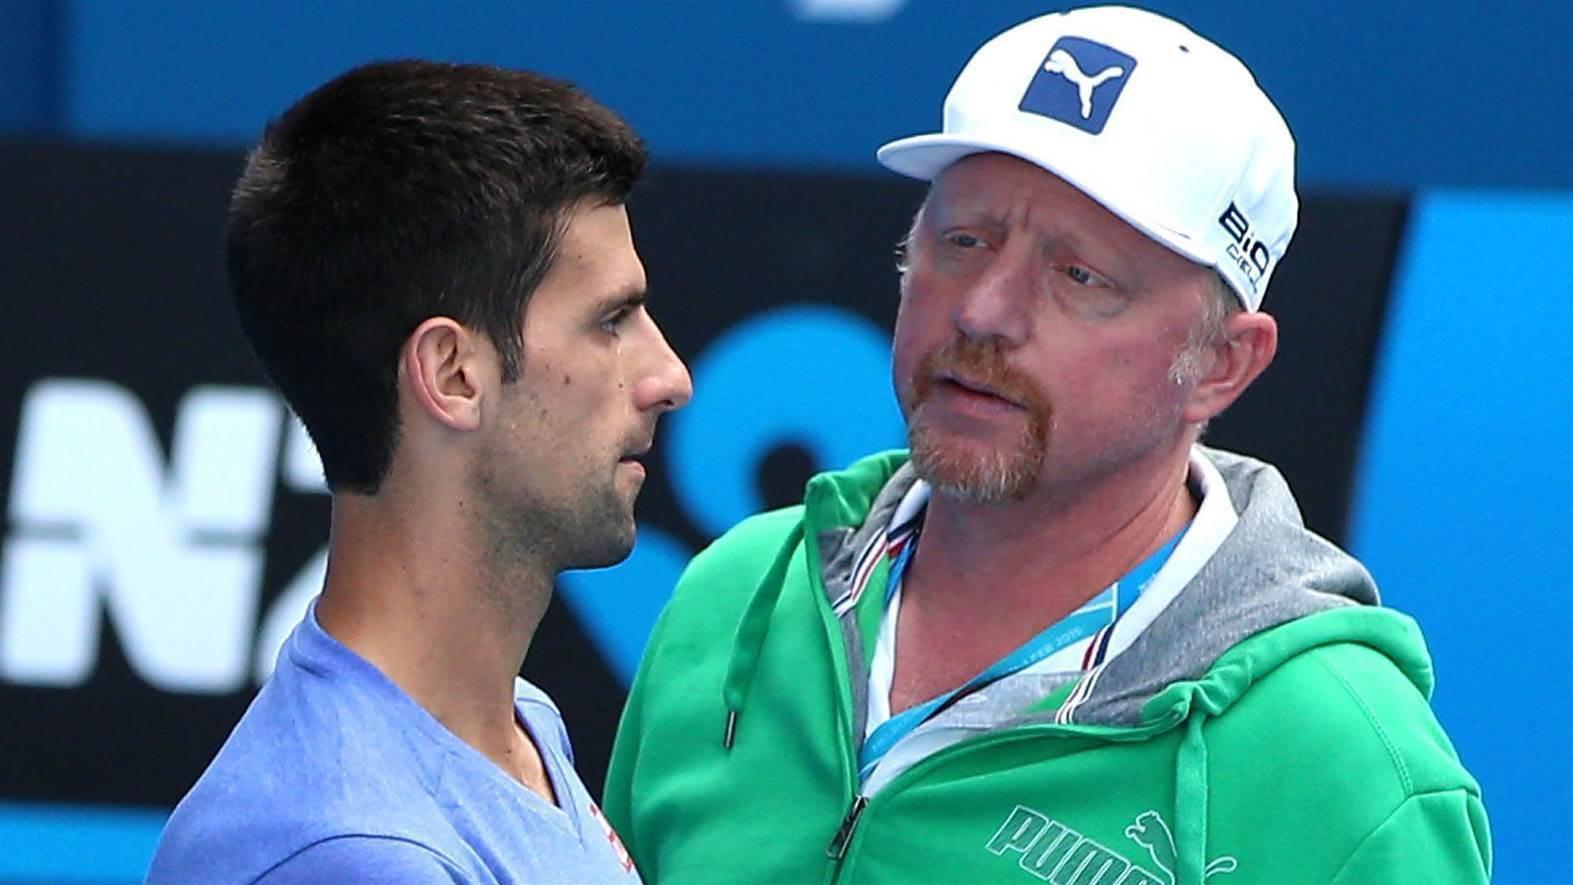 Becker slams Djokovic's Aussie Open exit